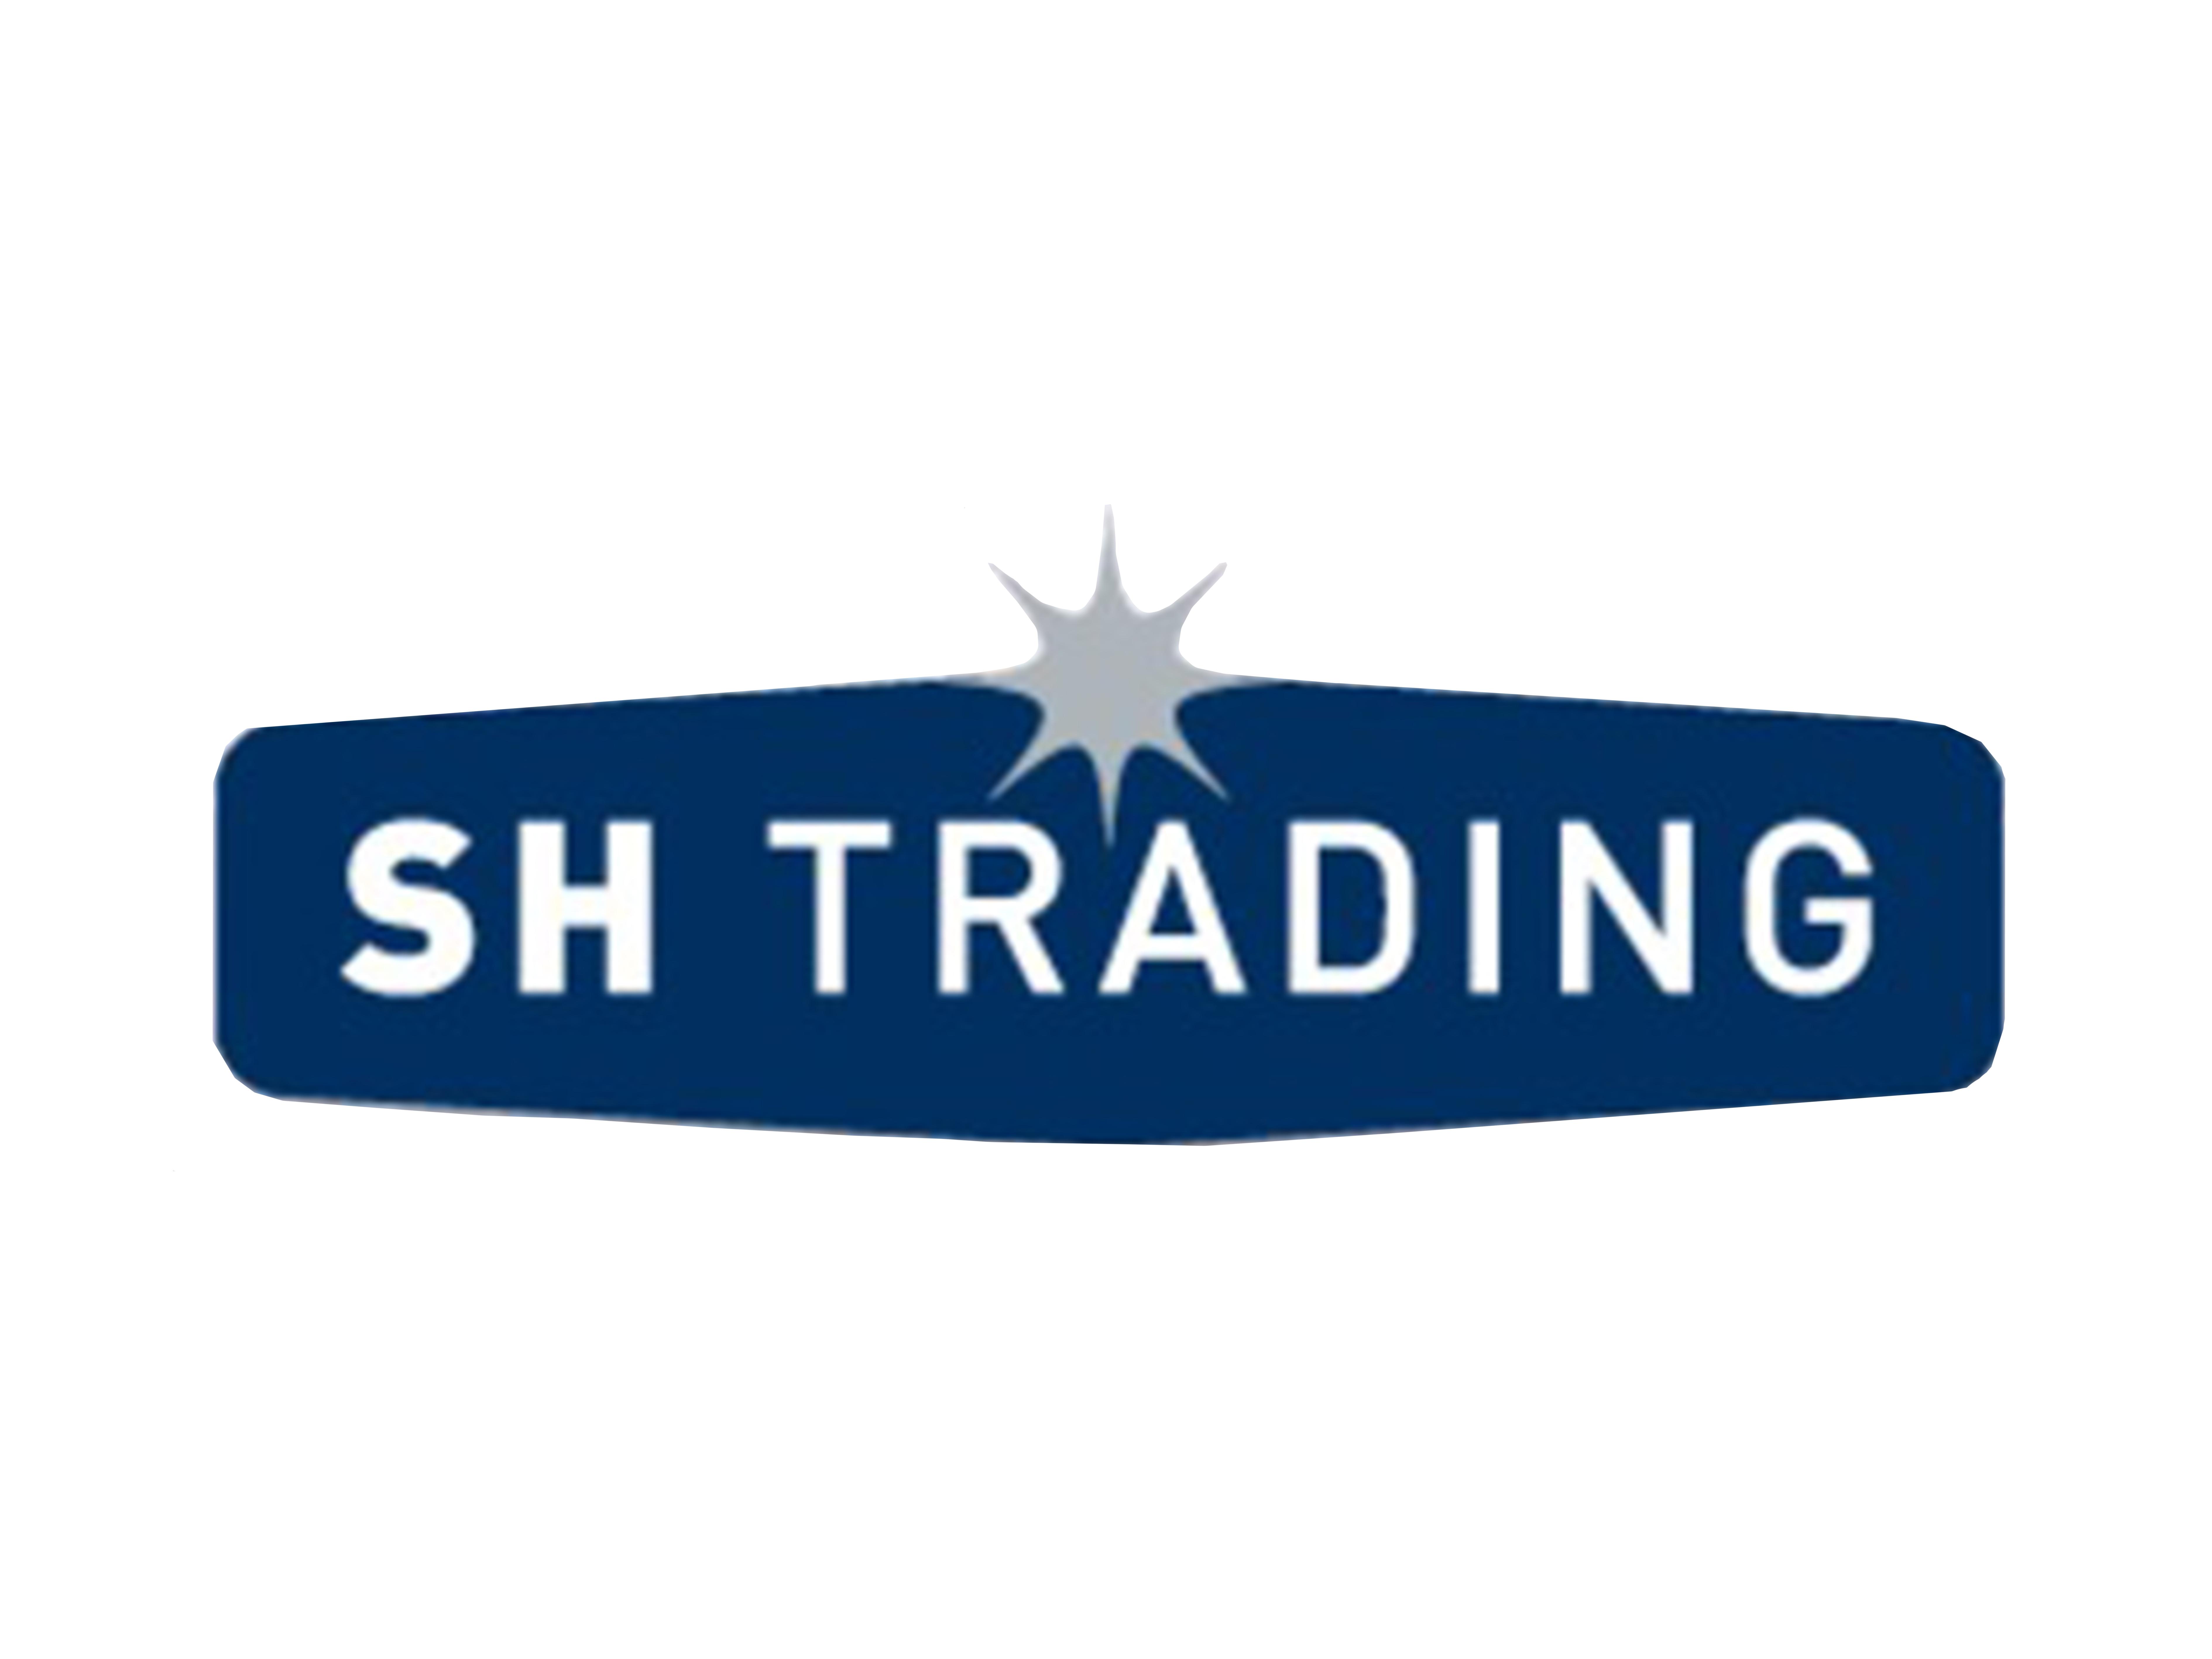 SH Trading logo